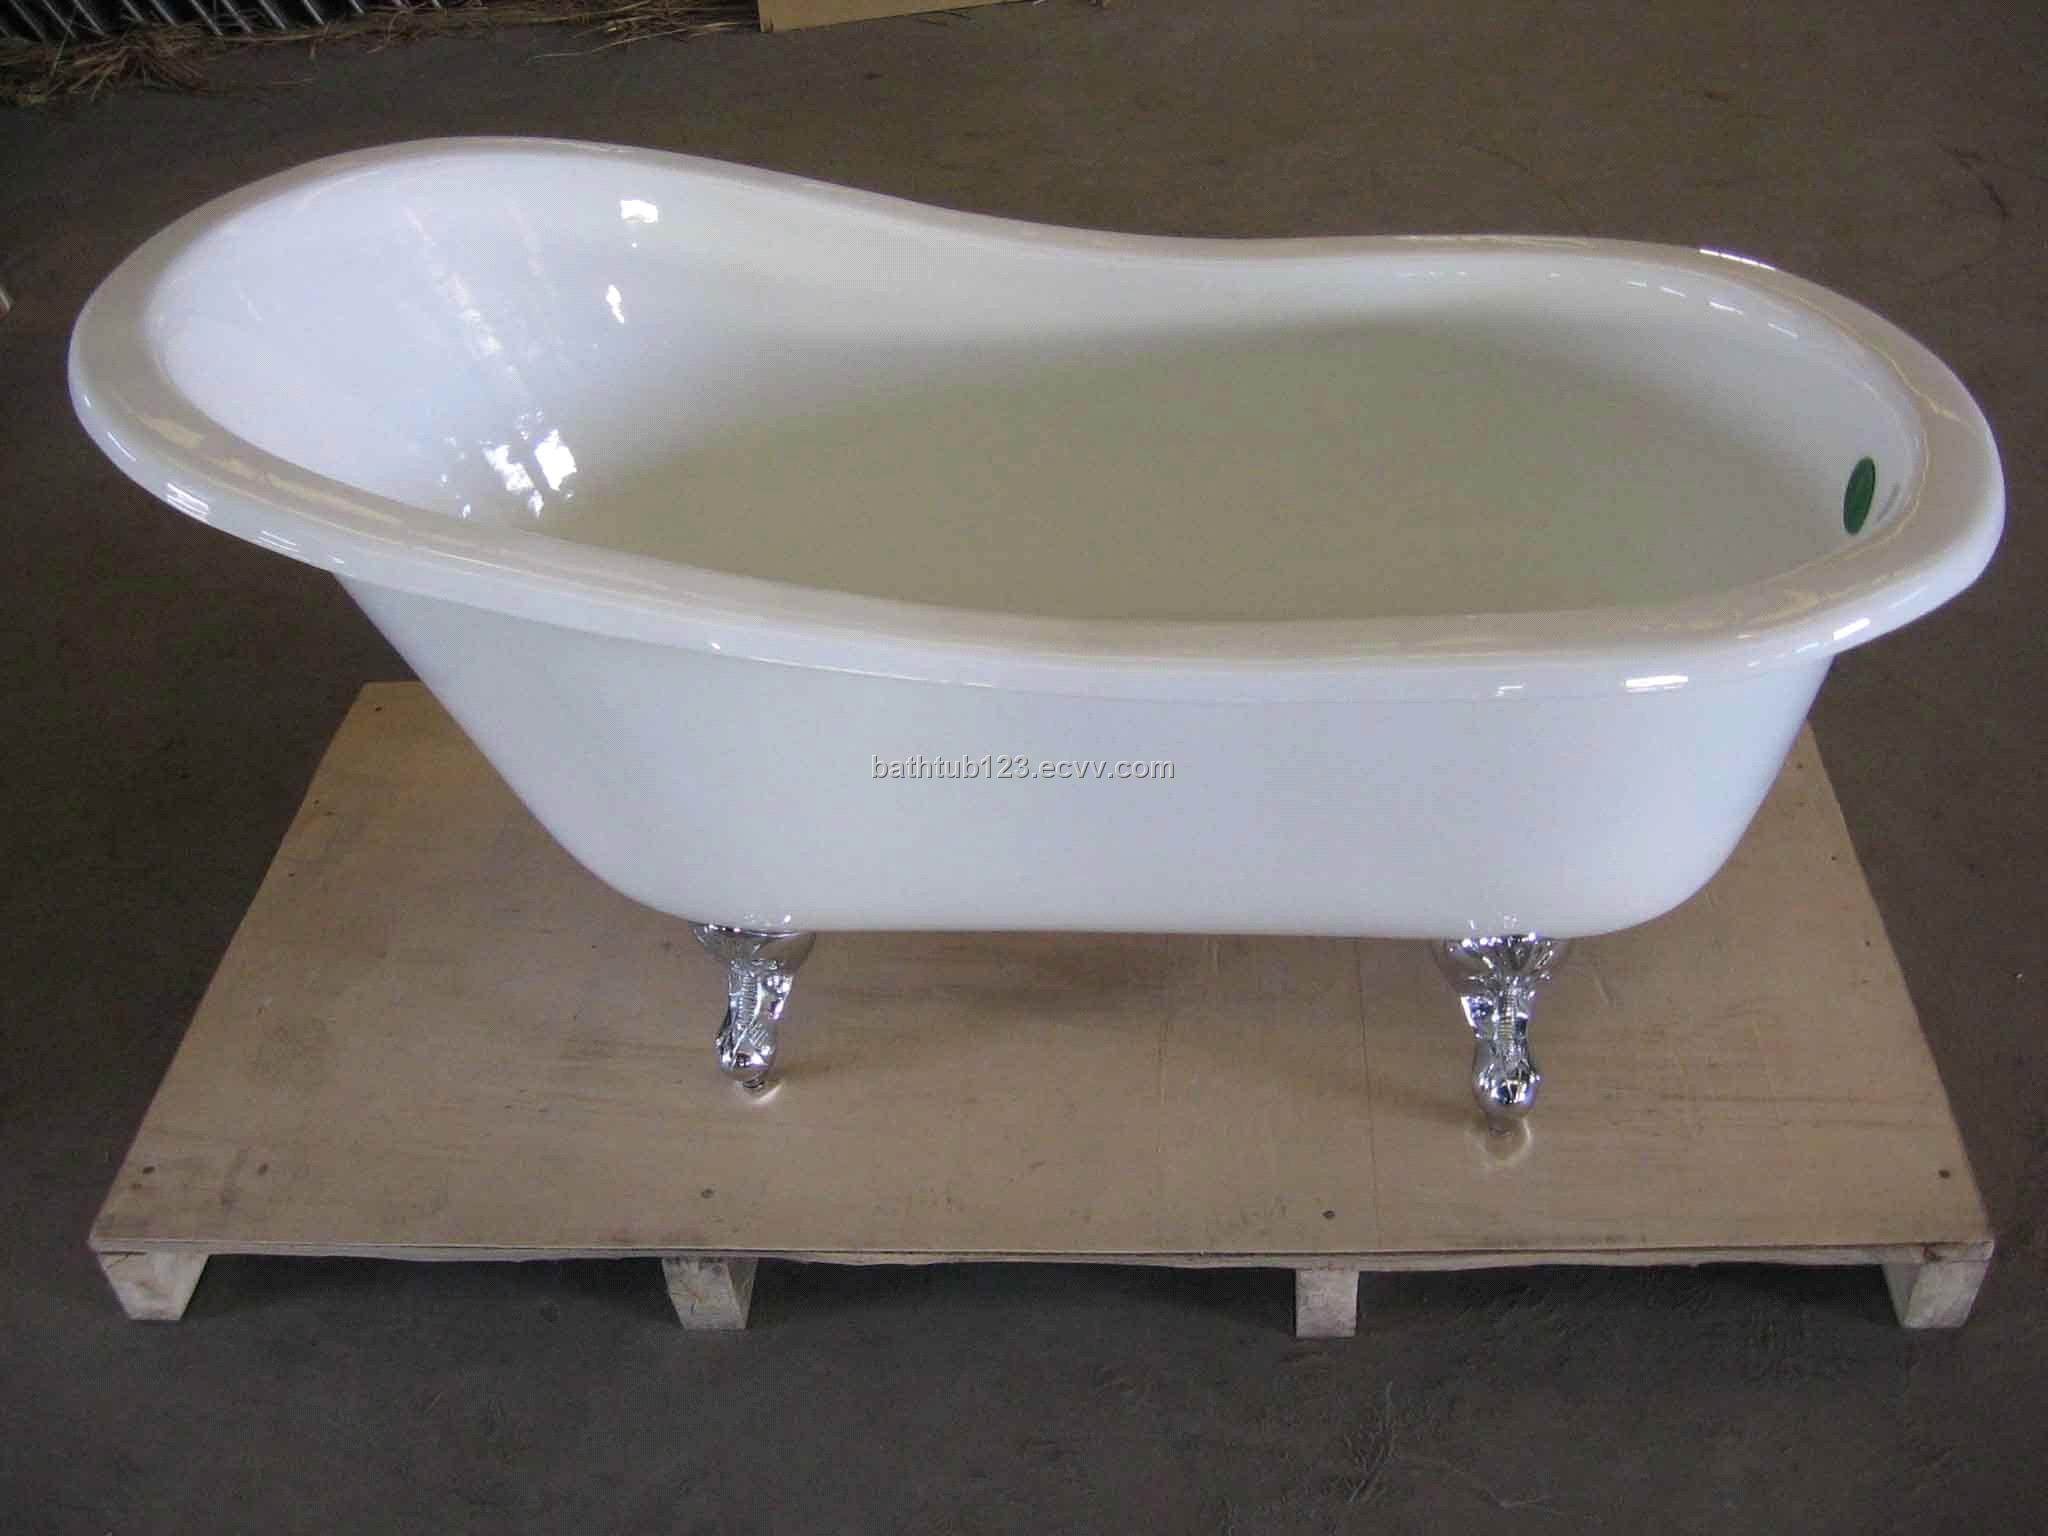 Simple Cast Iron Bathtub purchasing, souring agent | ECVV.com ...